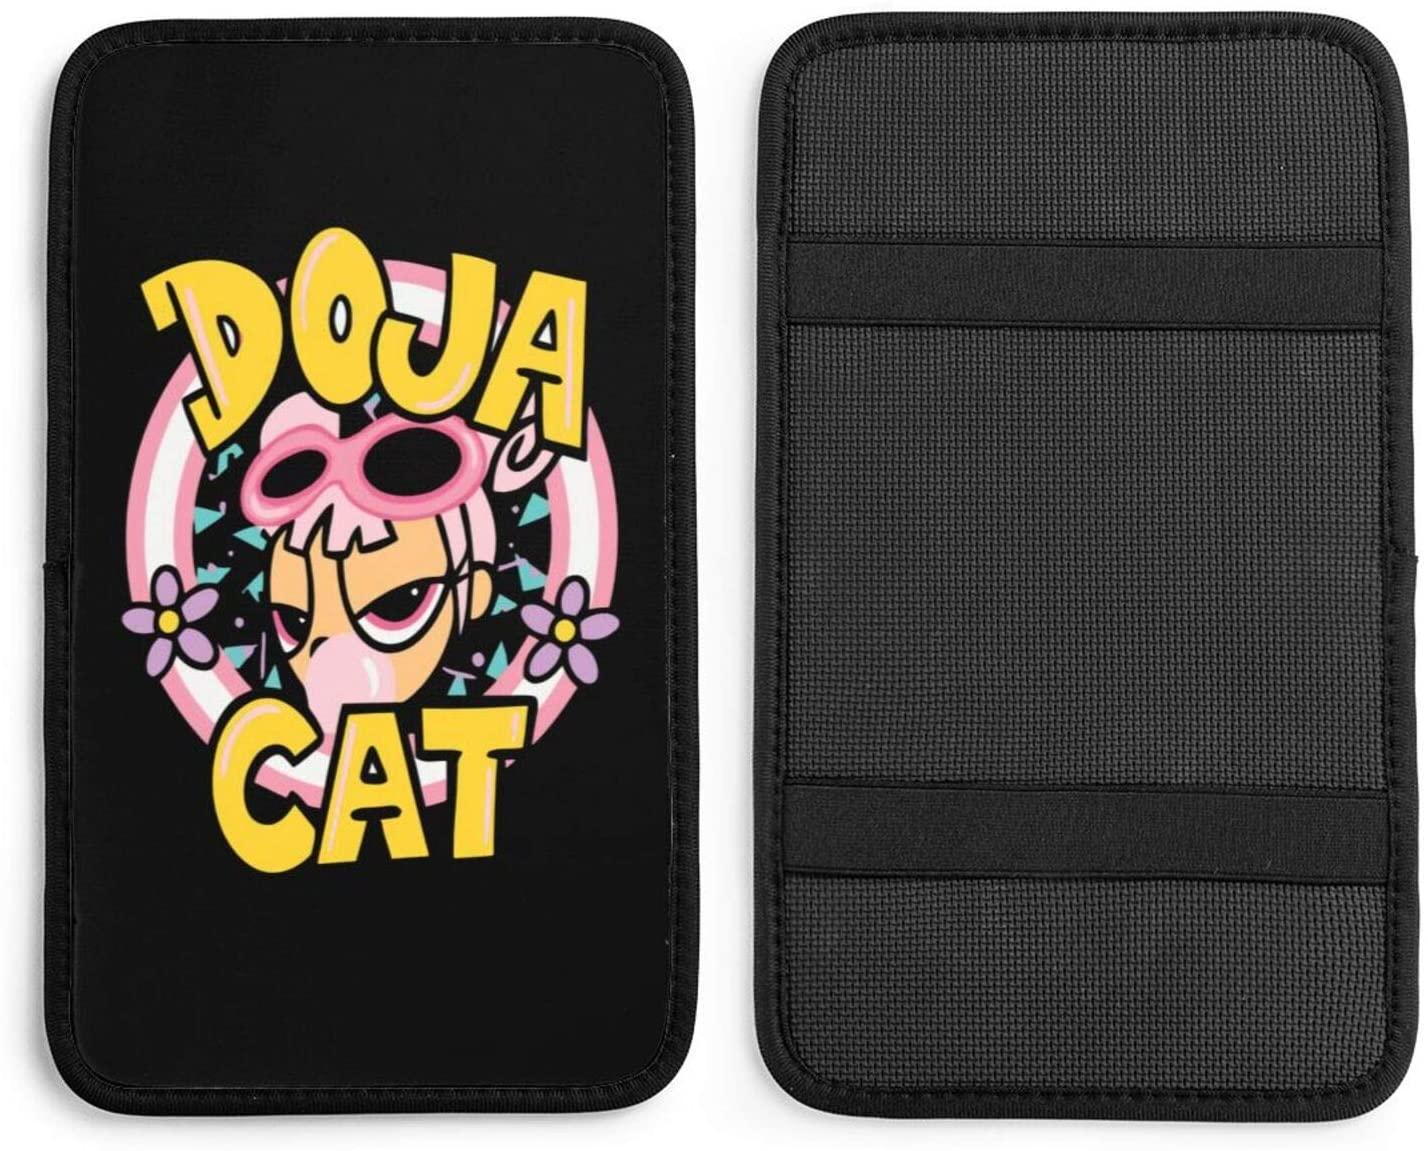 Doja Cat - Say So Lollipop Handrail Box Pad Car Center Console Box Arm Rest Pads Cushion Protector Universal Cover Armrest Decor